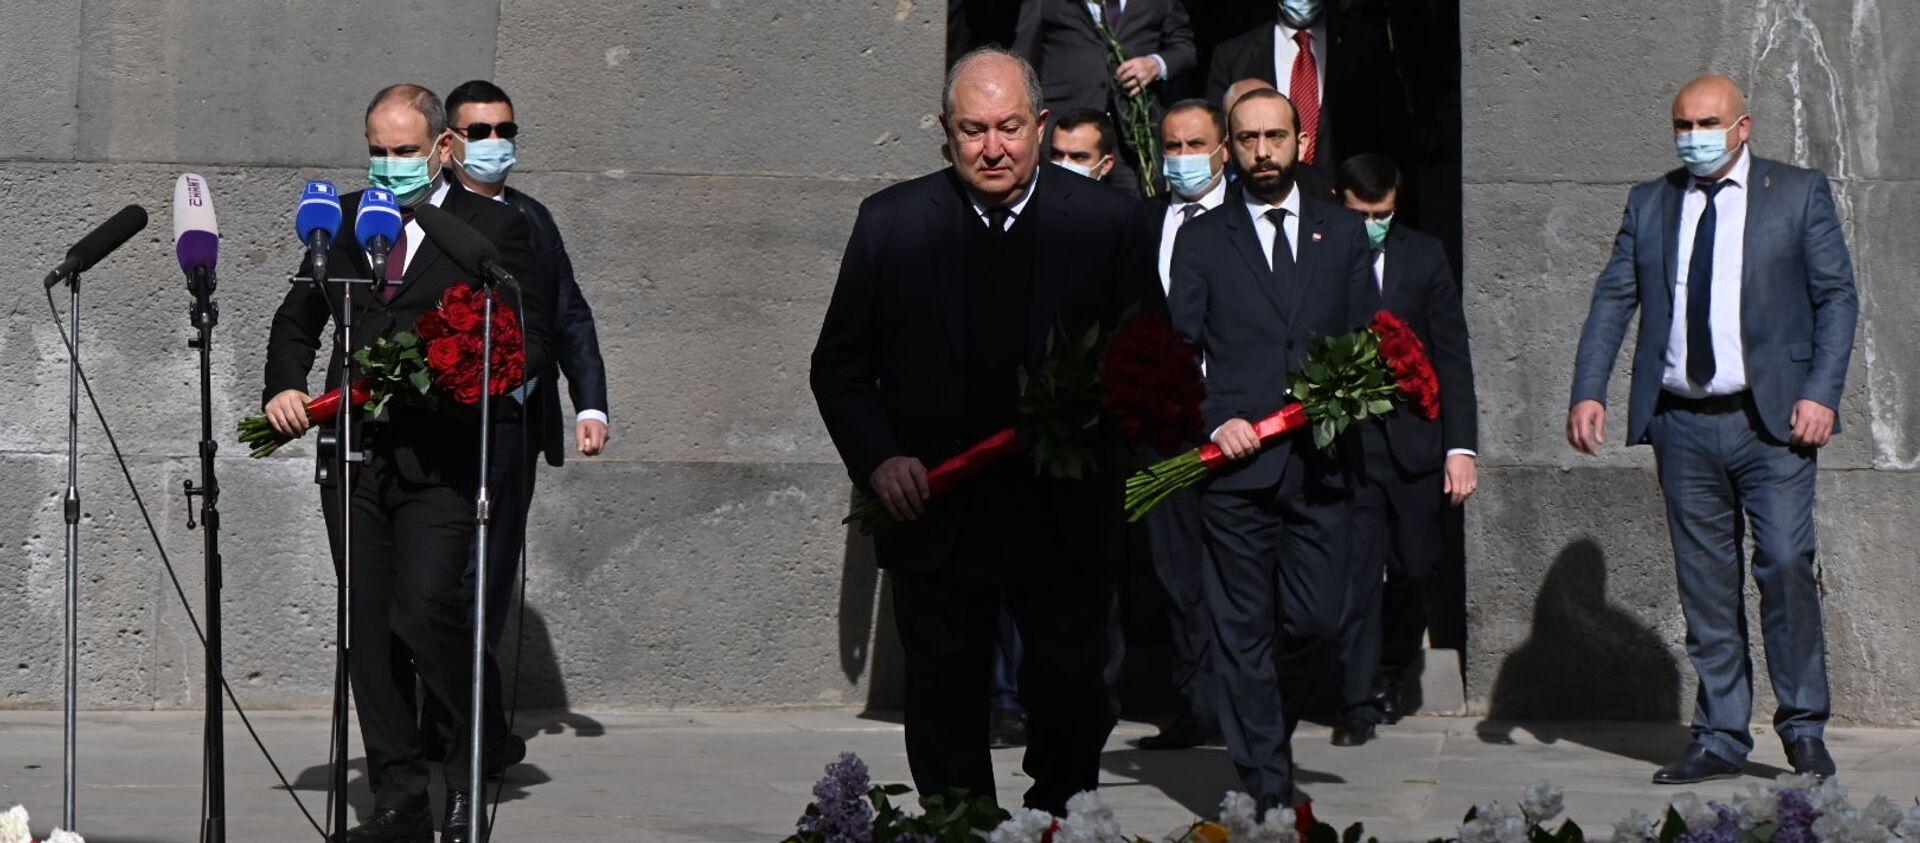 Армен Саркисян посетил мемориальный комплекс Цицернакаберд (24 апреля 2021). Ереван - Sputnik Армения, 1920, 30.04.2021